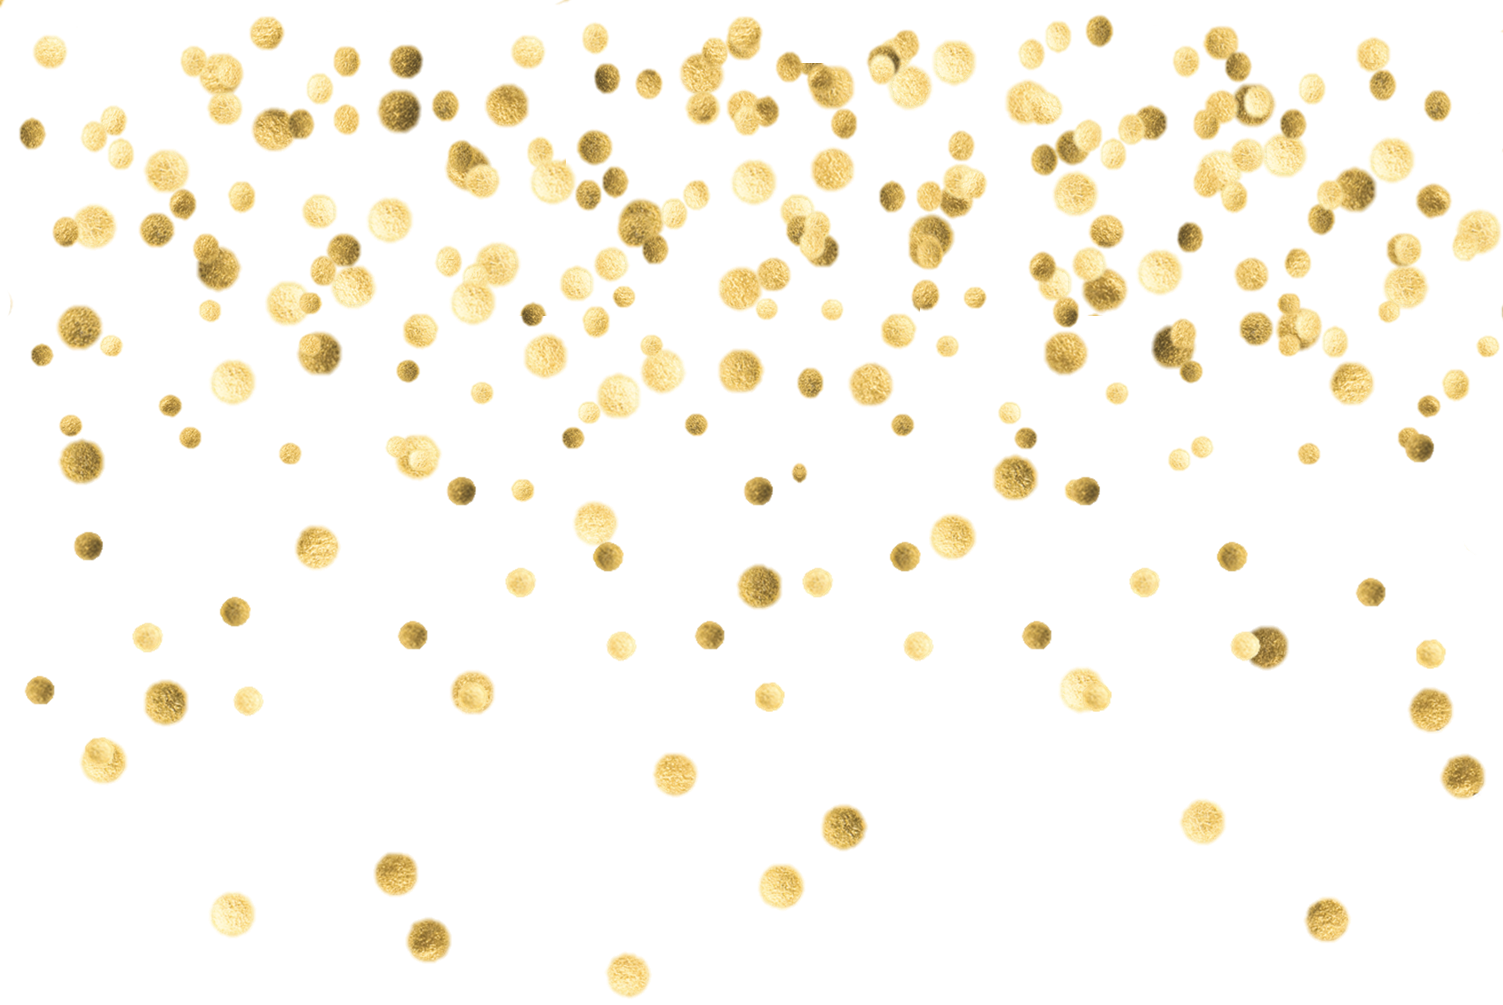 Star confetti clipart vector black and white library 28+ Collection of Gold Confetti Clipart Transparent | High quality ... vector black and white library